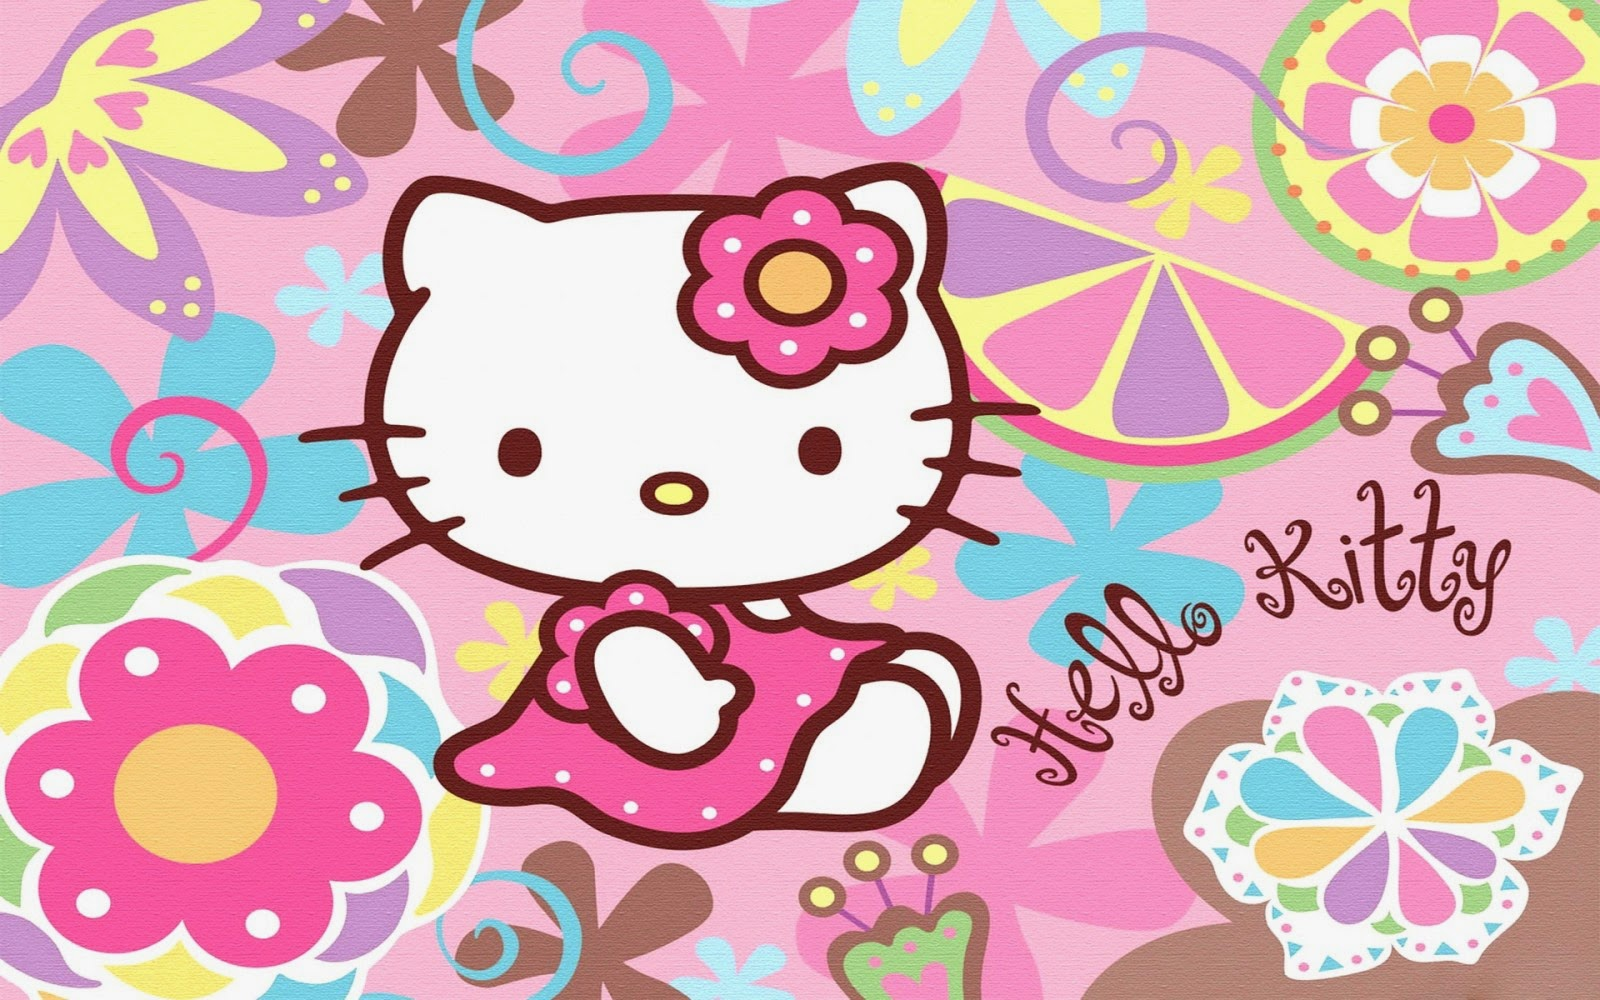 Cool Wallpaper Hello Kitty Butterfly - Gambar%2BWallpaper%2BHello%2BKitty%2BHD%2BLucu%2B1280%2Bx%2B800  Snapshot_11943.jpg